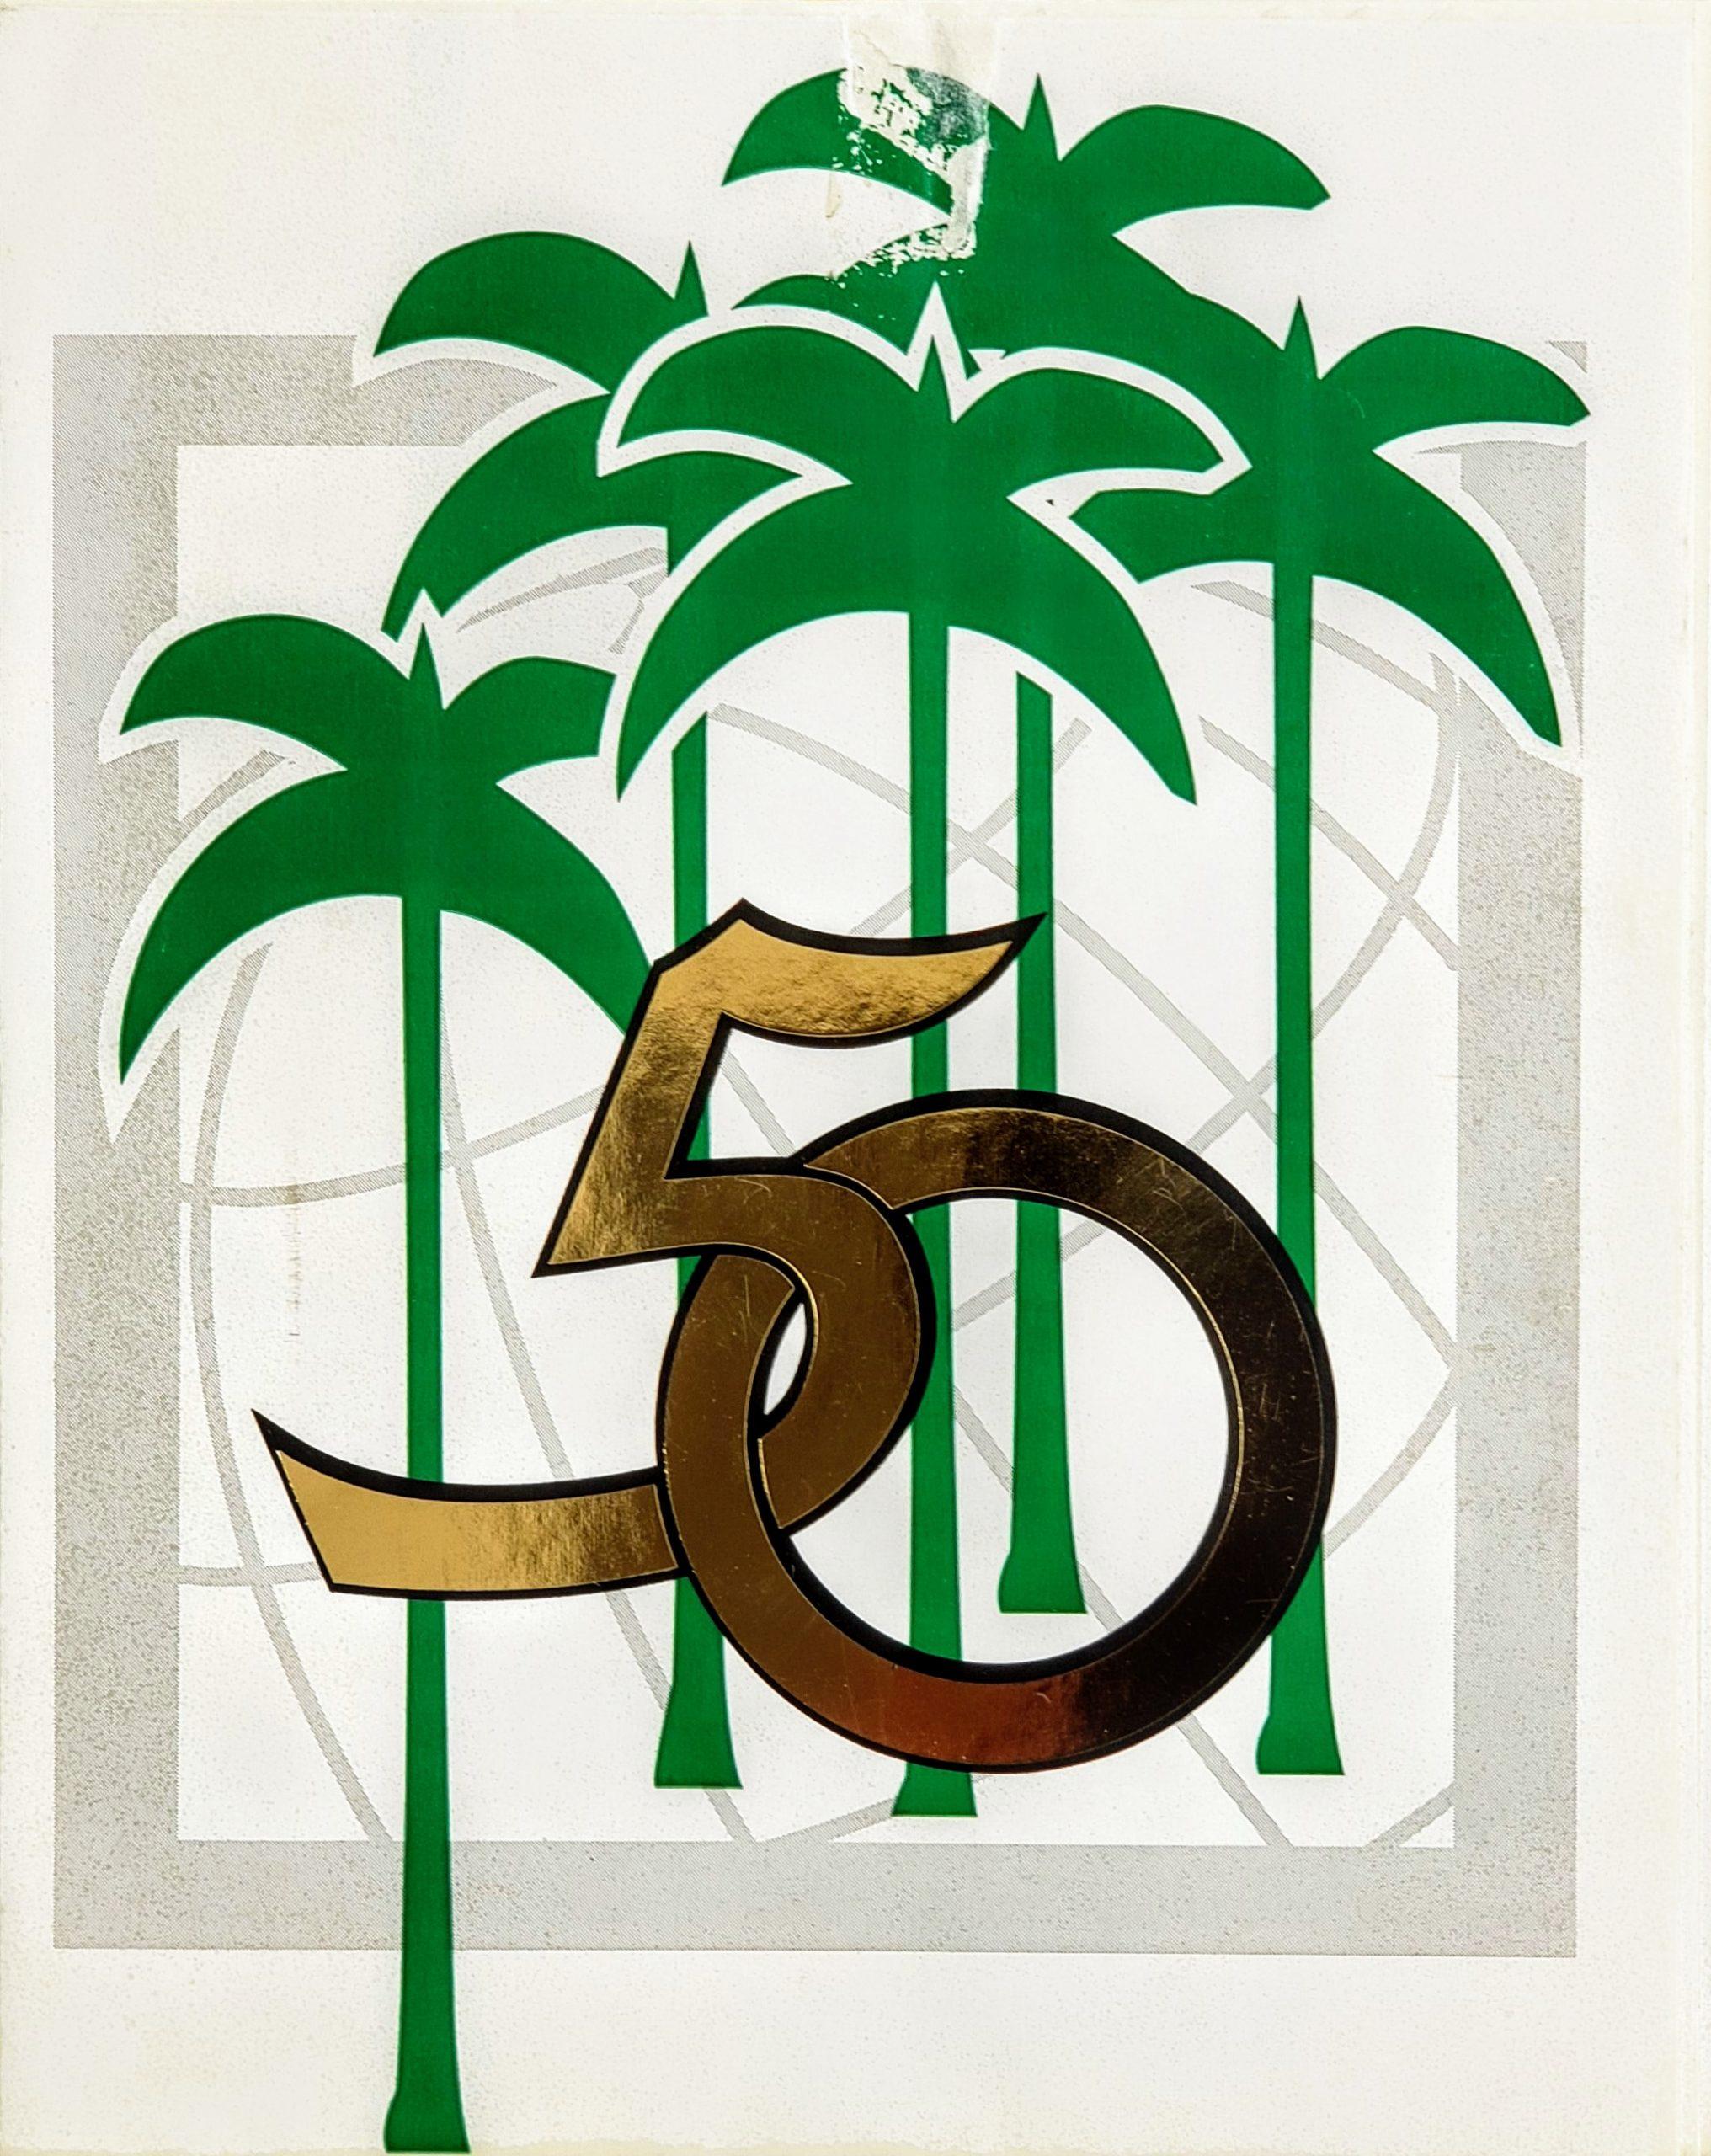 olayan_50th anniversary emblem_10